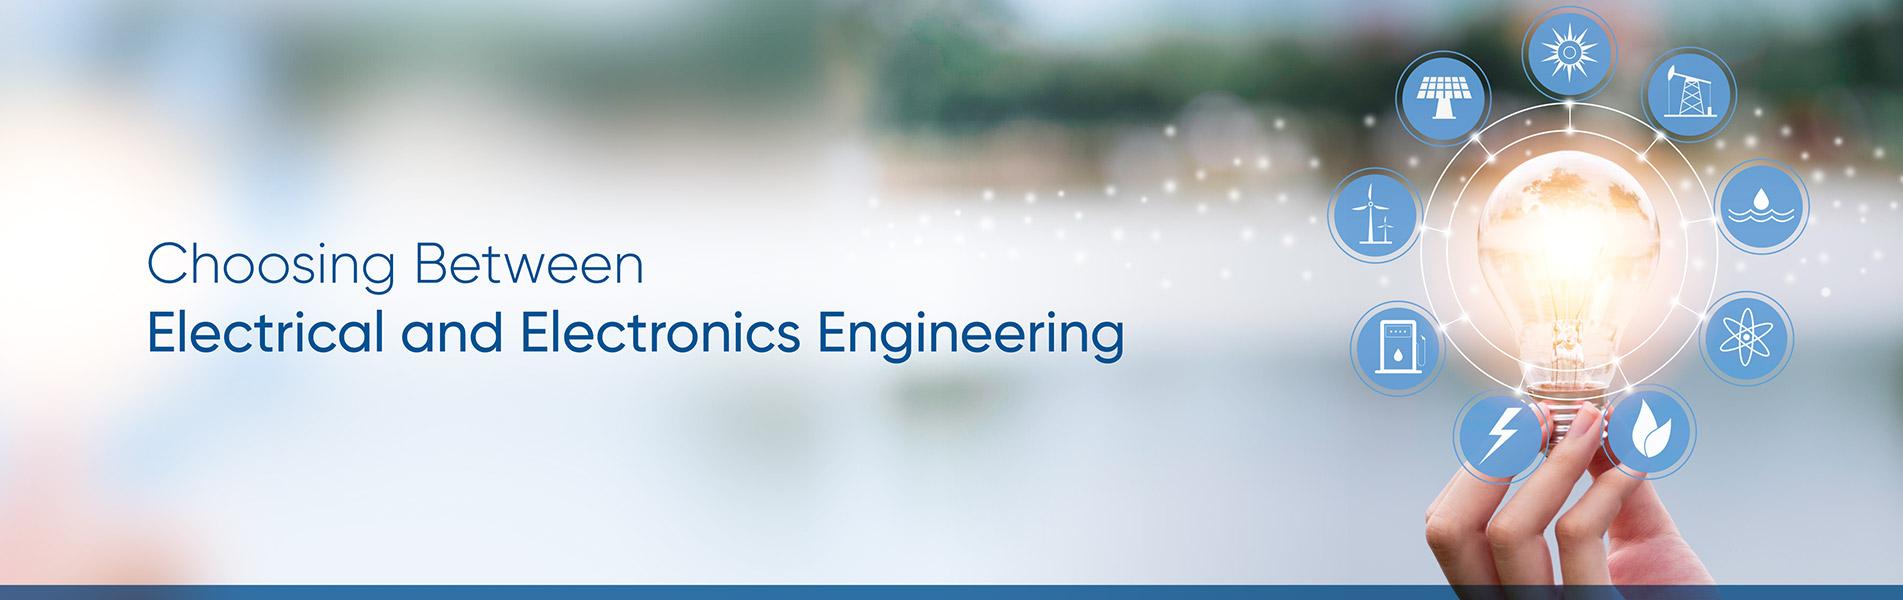 electrical engineering, electronics engineering